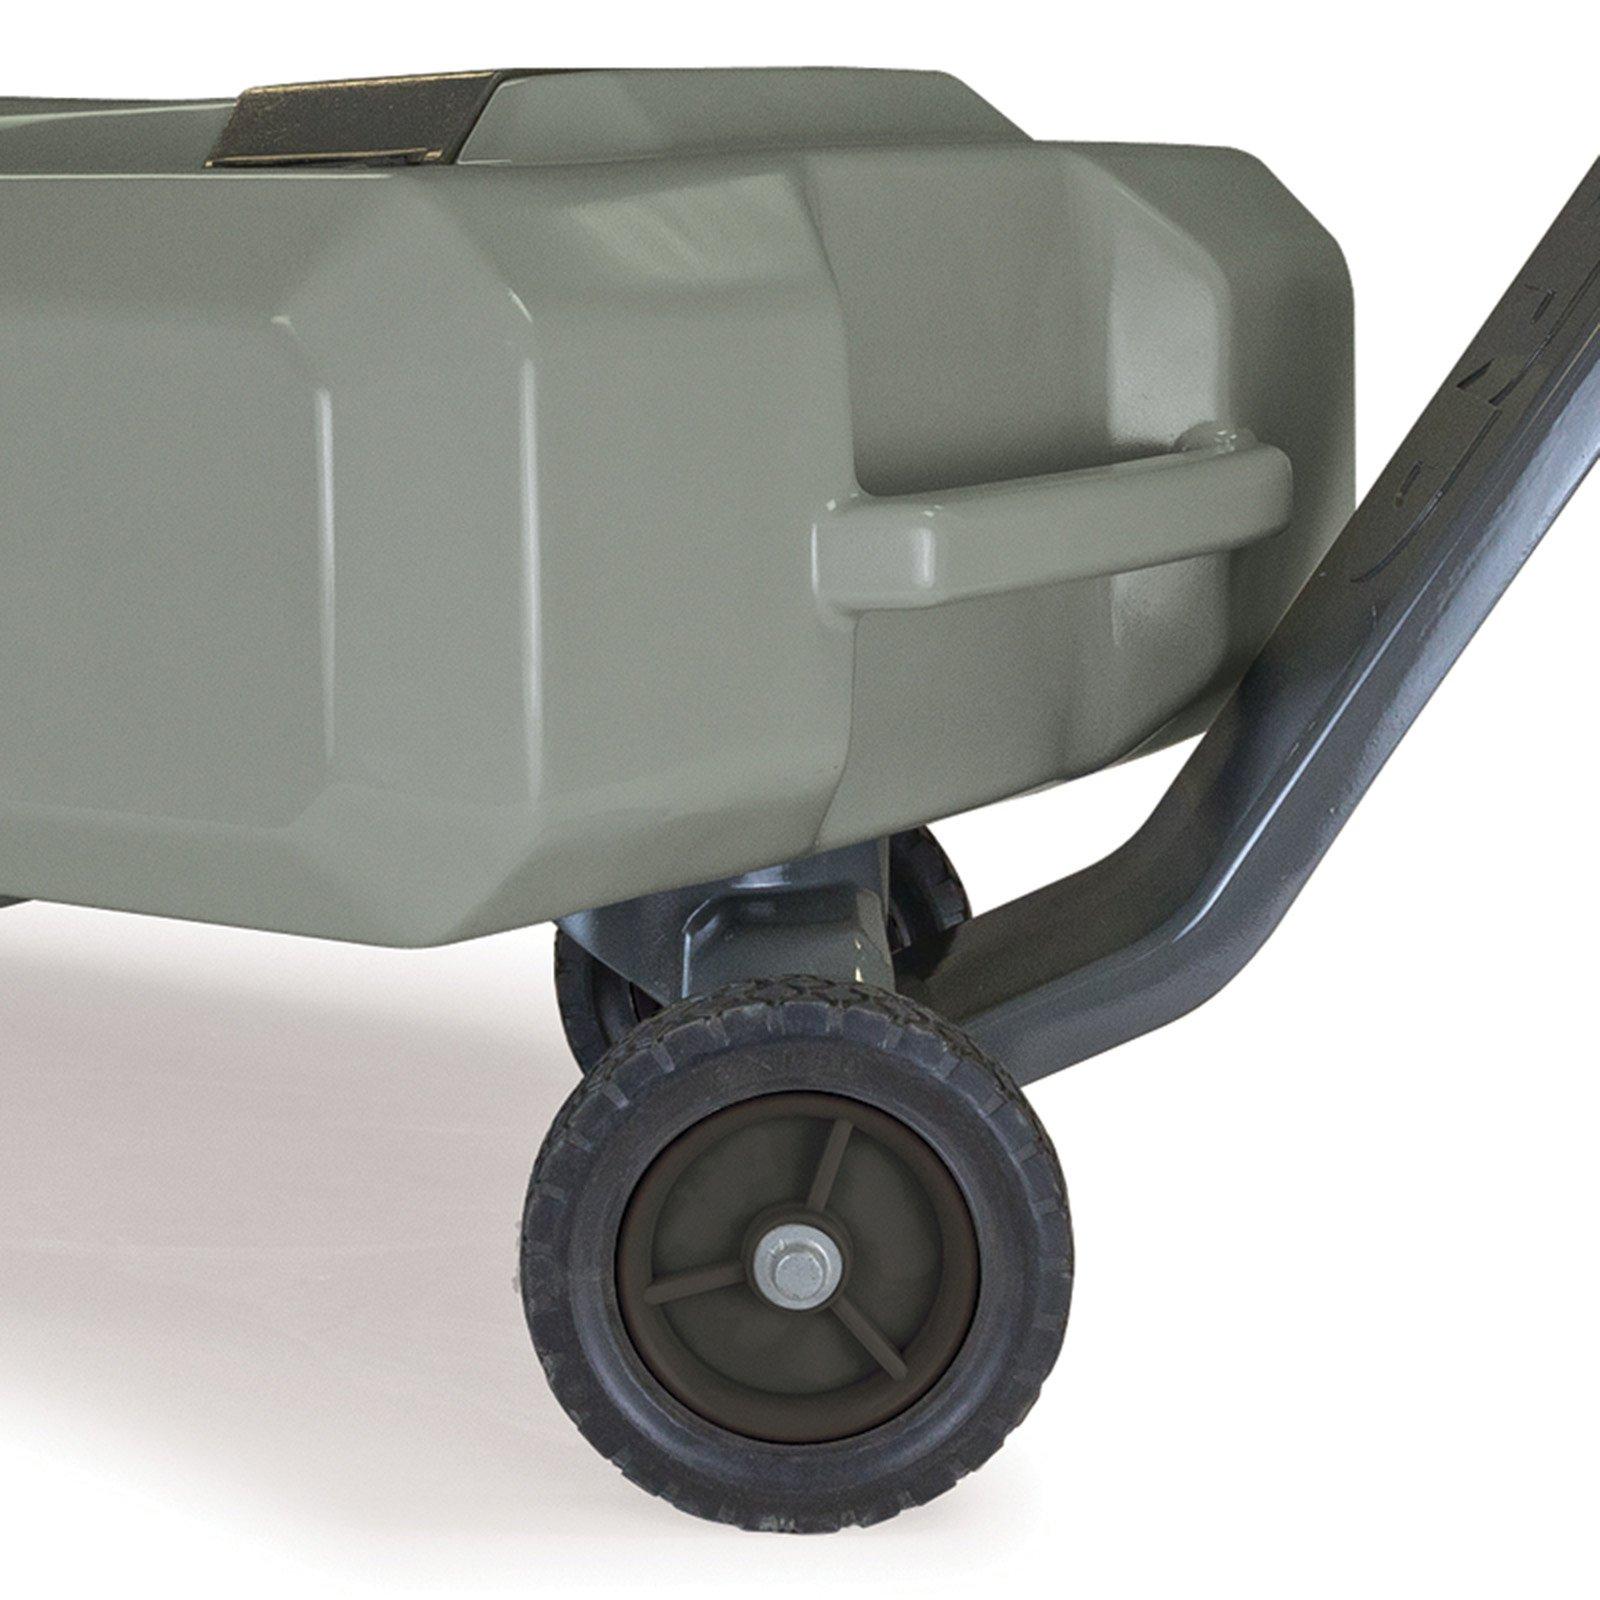 SmartTote2 40518 LX Portable RV Waste Tote Tank-4 Wheels-27 Gallons-Thetford-40518 by SmartTote2 (Image #1)